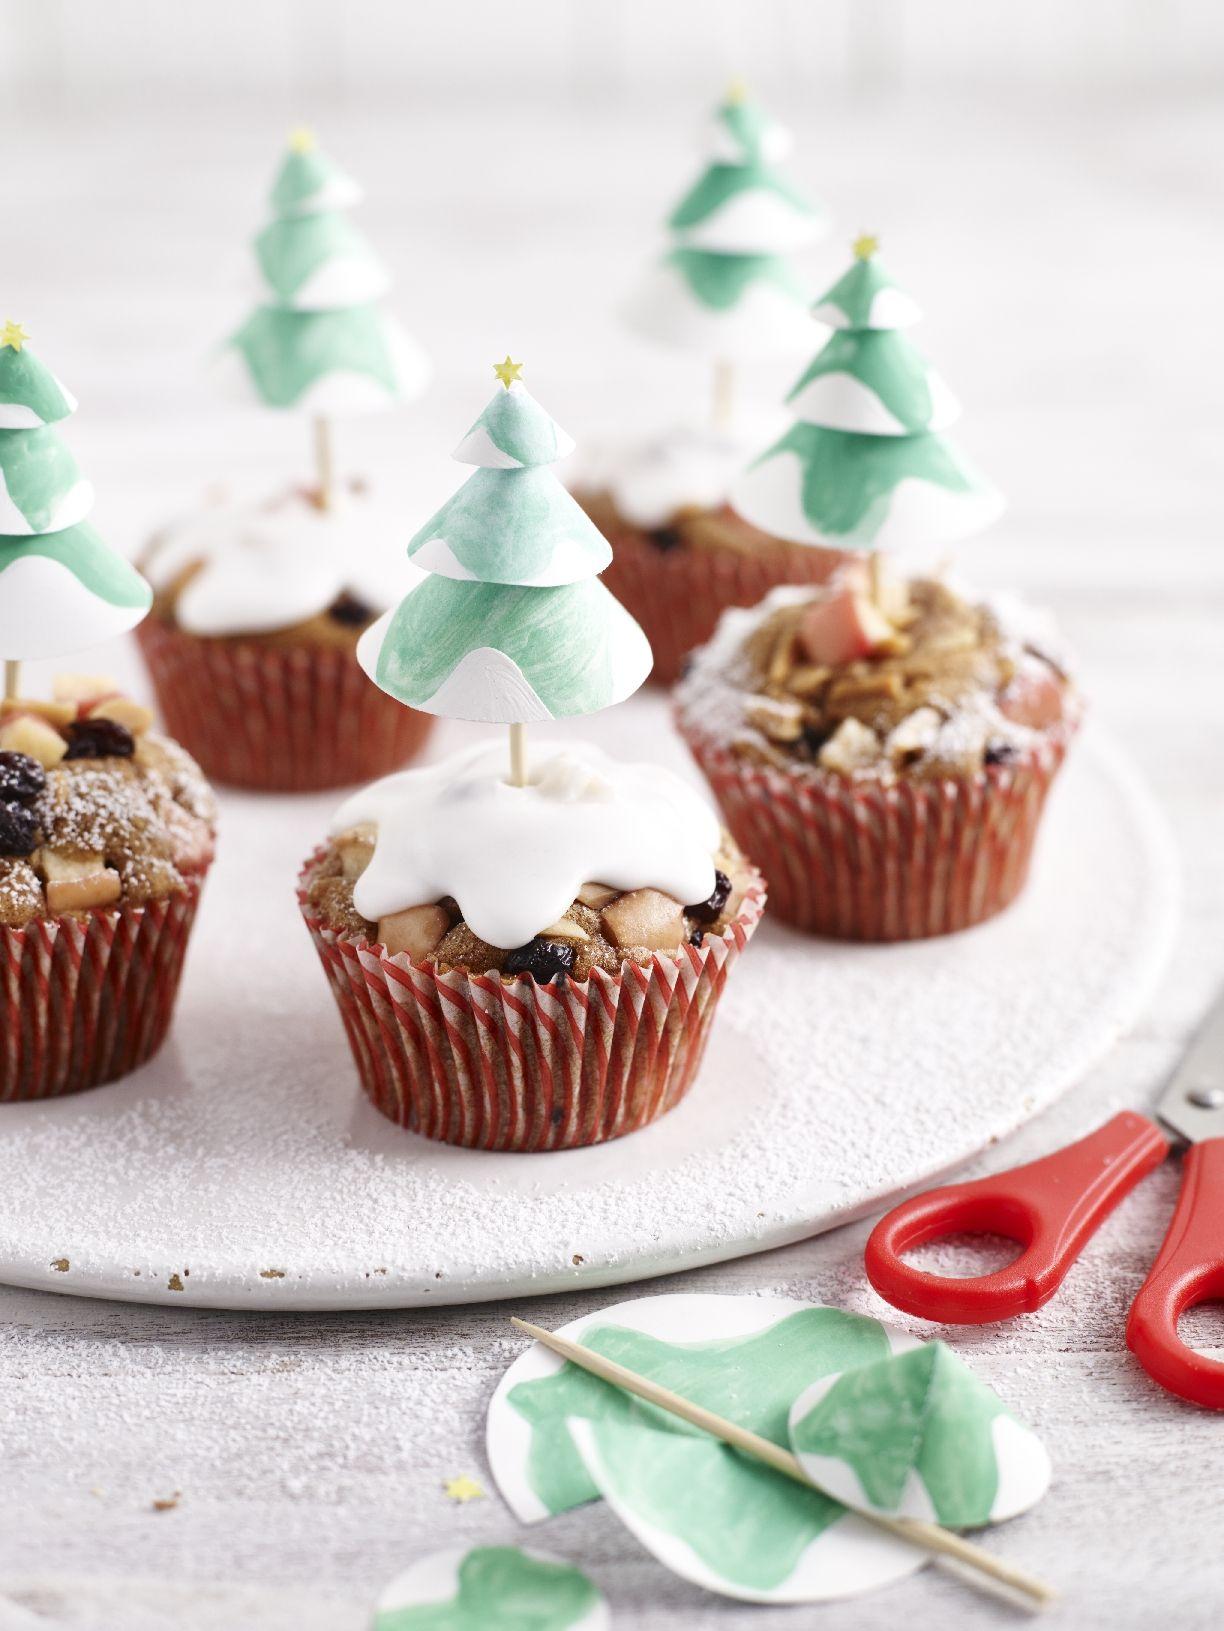 Apfel-Zimt-Muffins 21